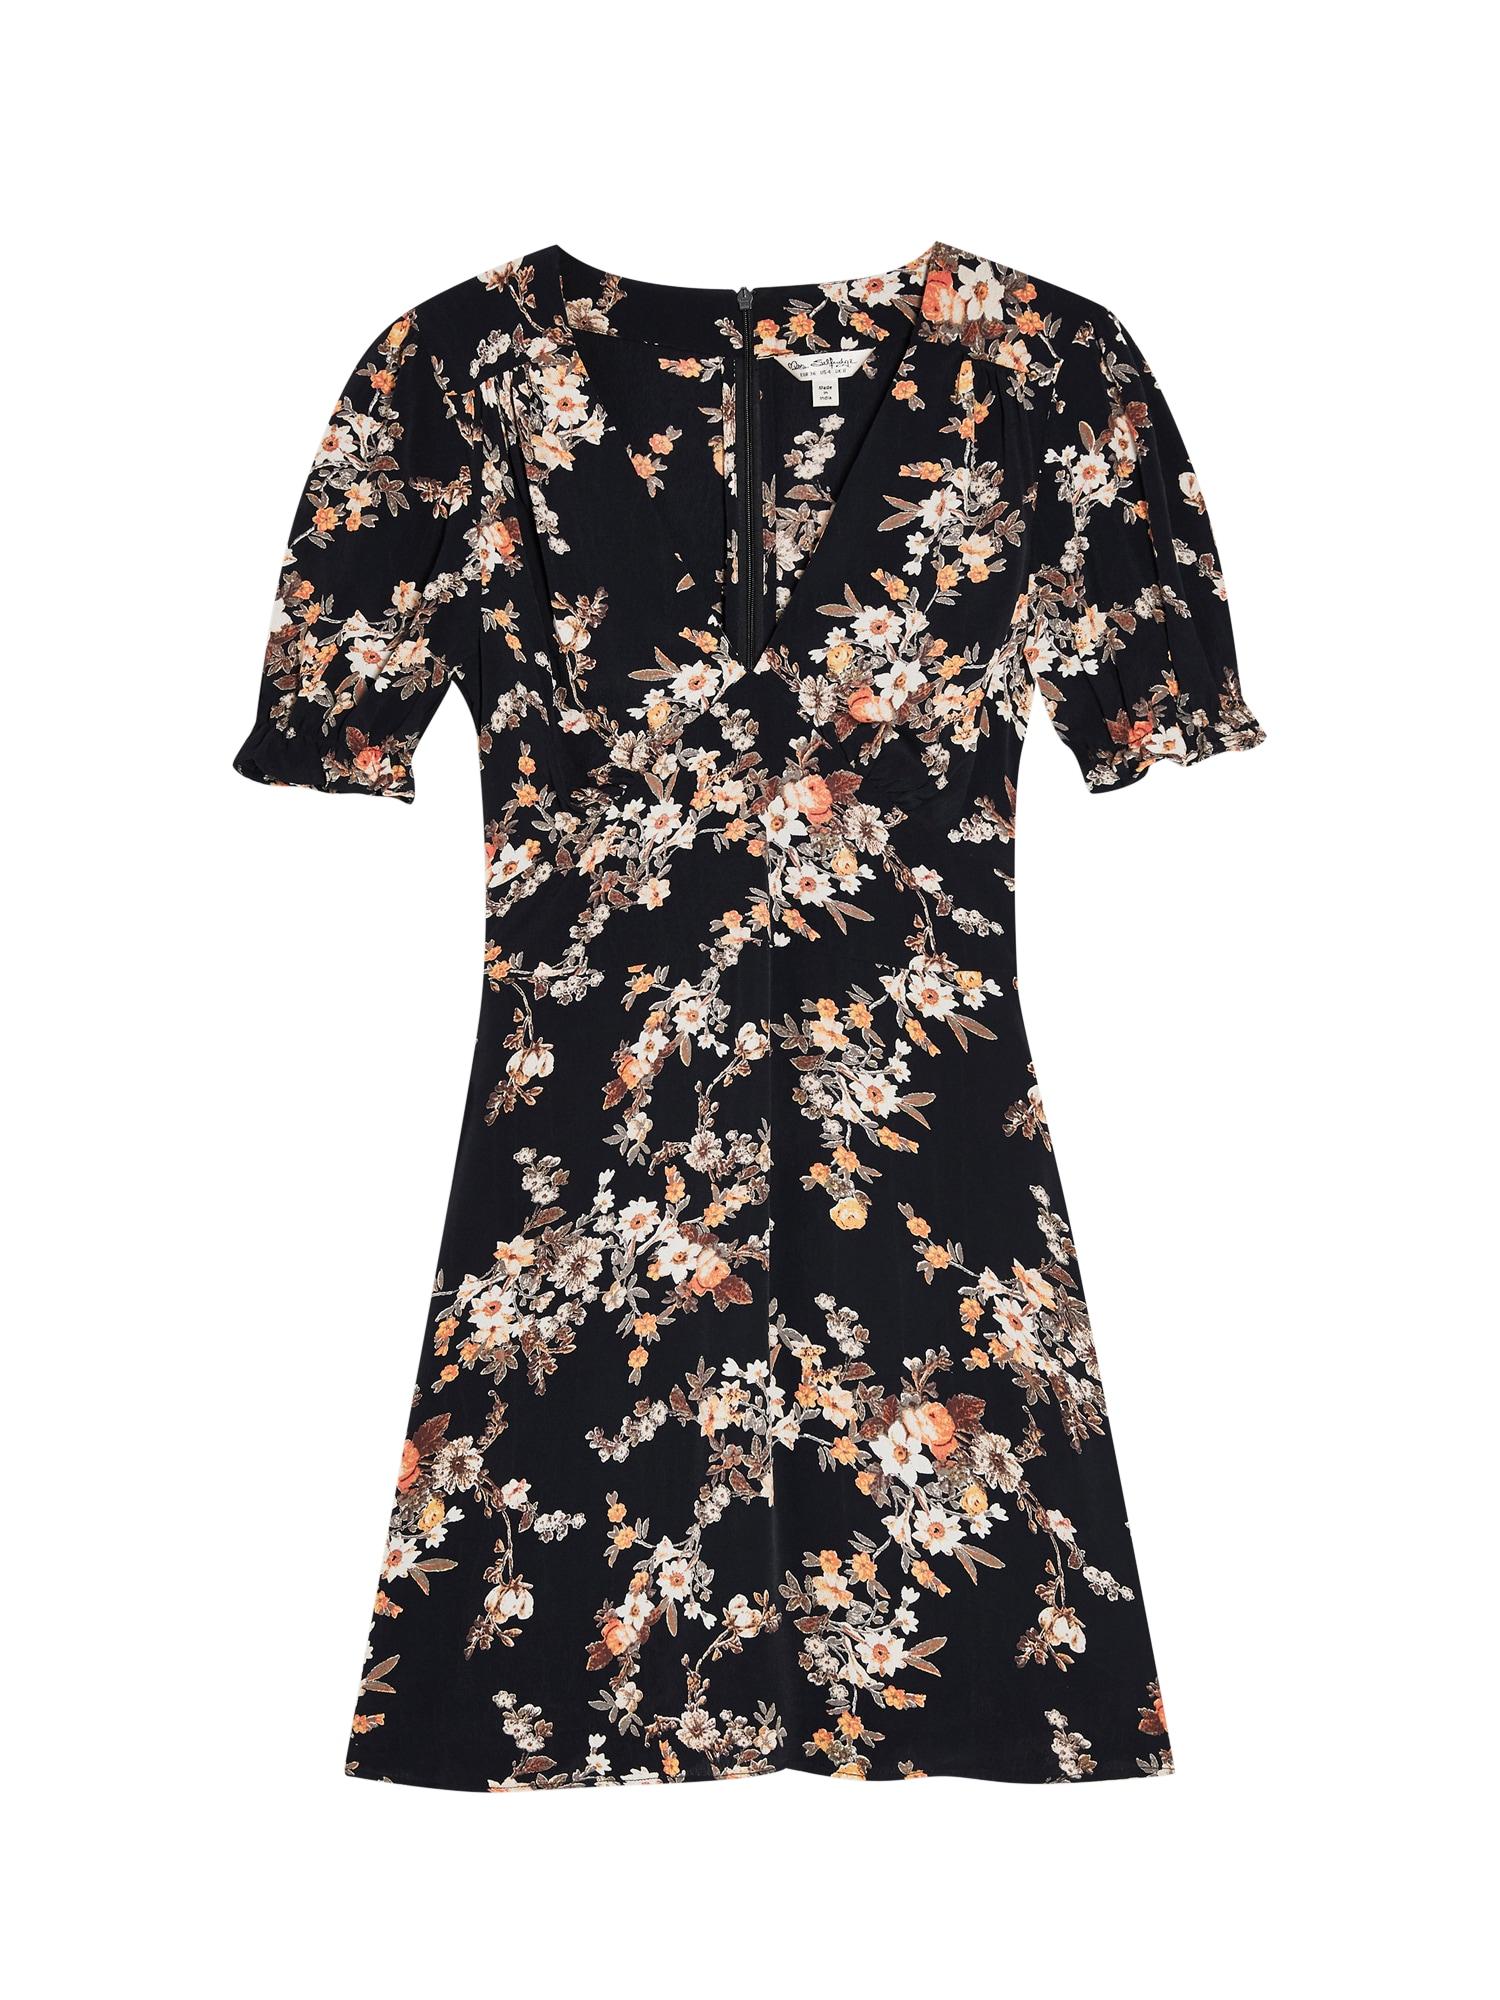 Miss Selfridge Rochie 'DITSY TEA DRESS'  culori mixte / negru